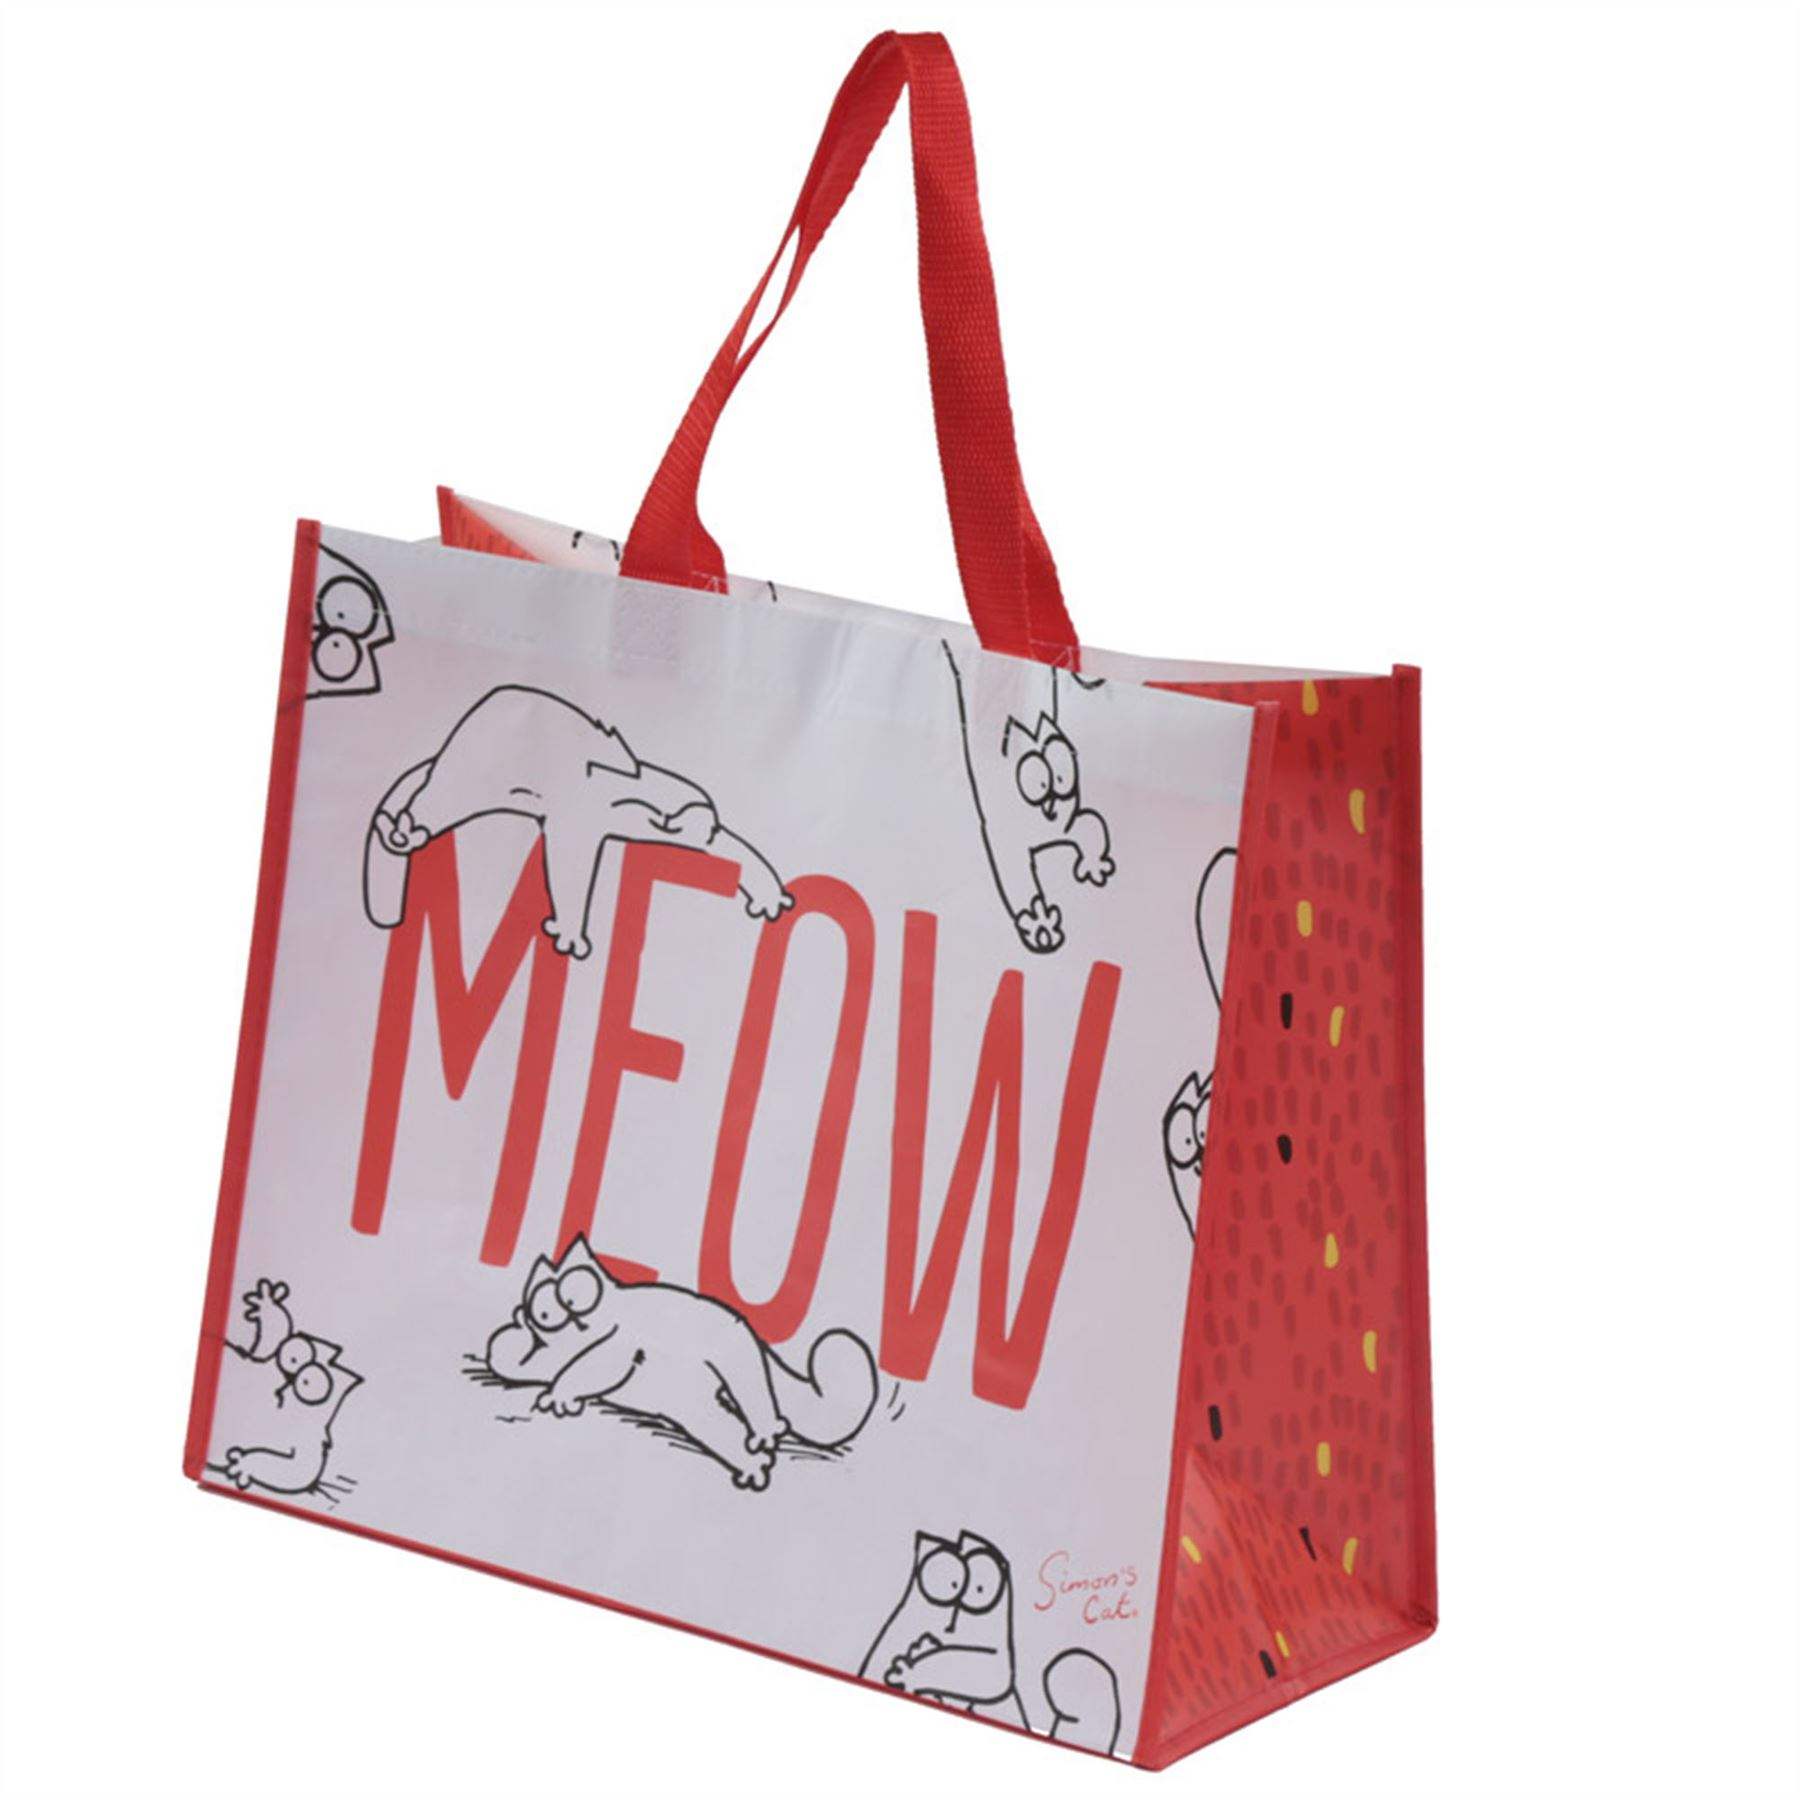 Simons Cat Shopping Bag 33cm High Tote Bag Reusable Simon's Cat | eBay